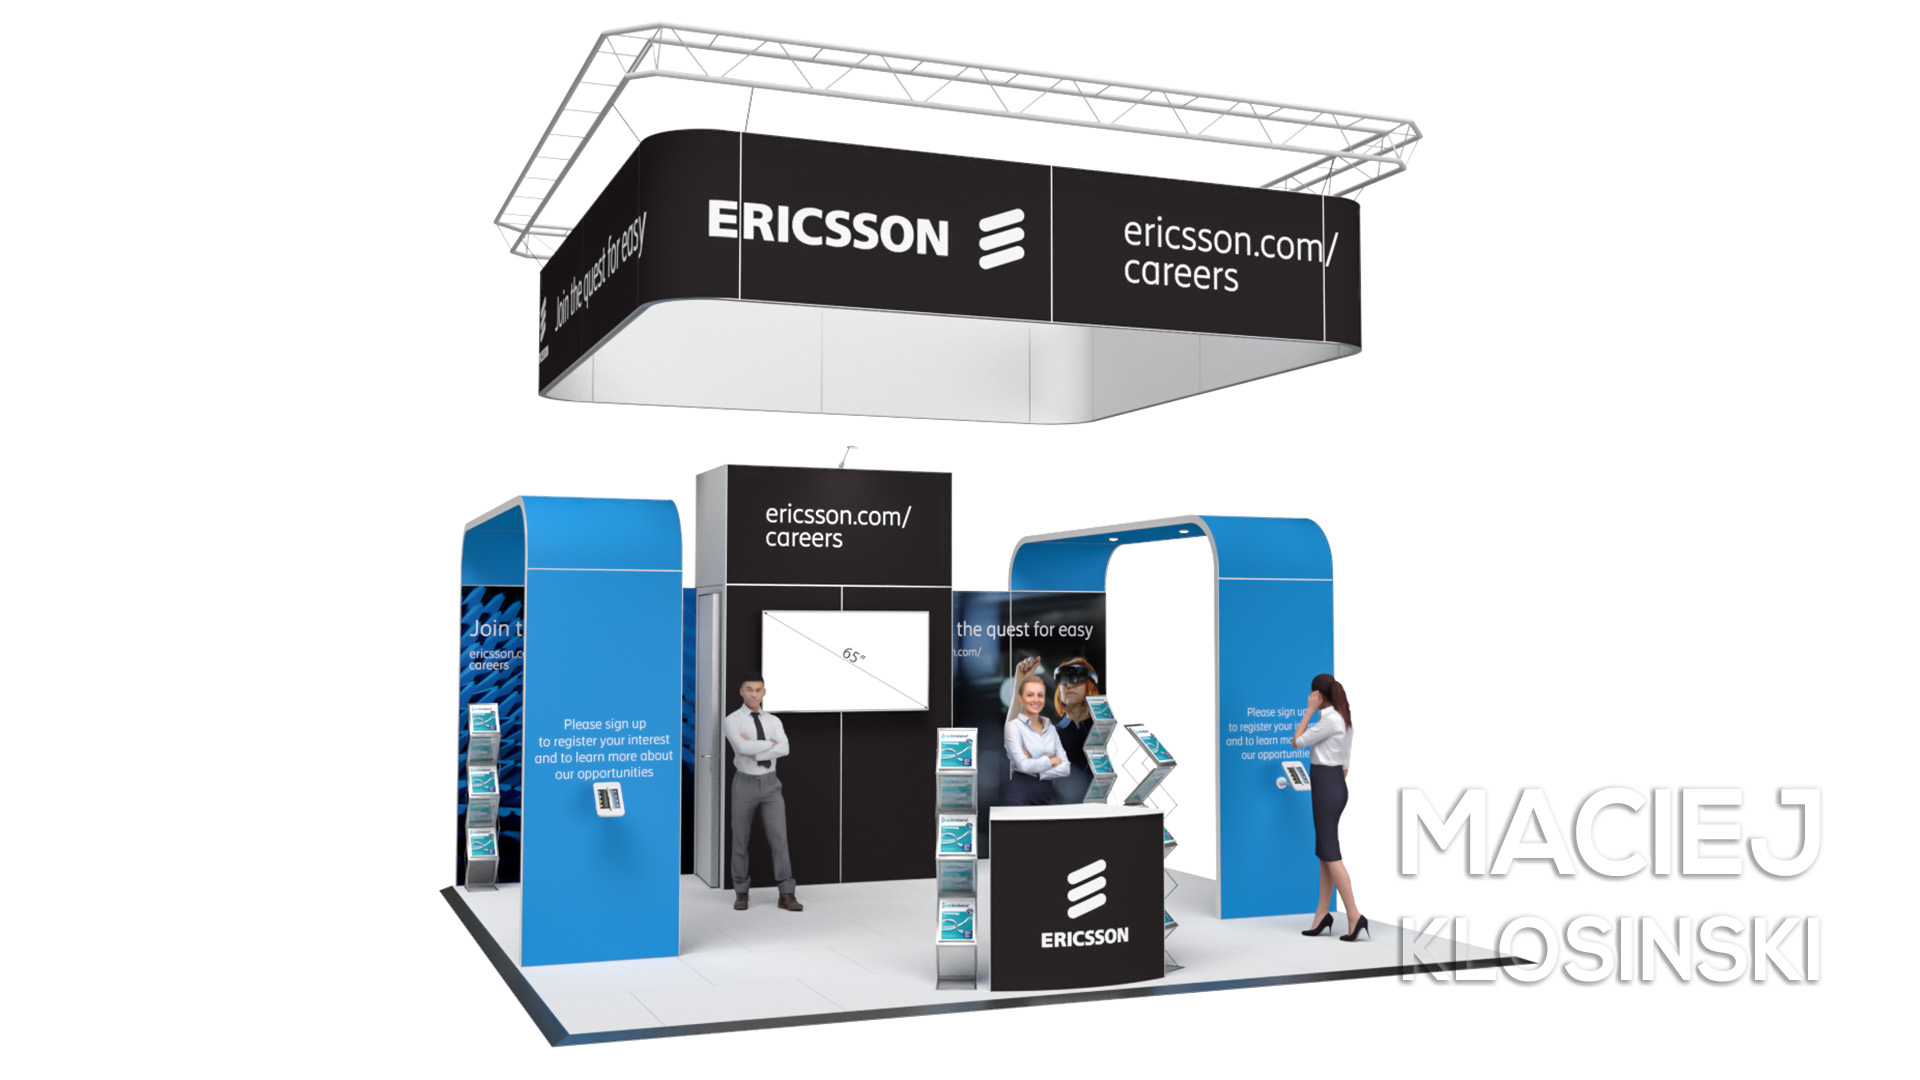 Ericsson at GradIreland 2018